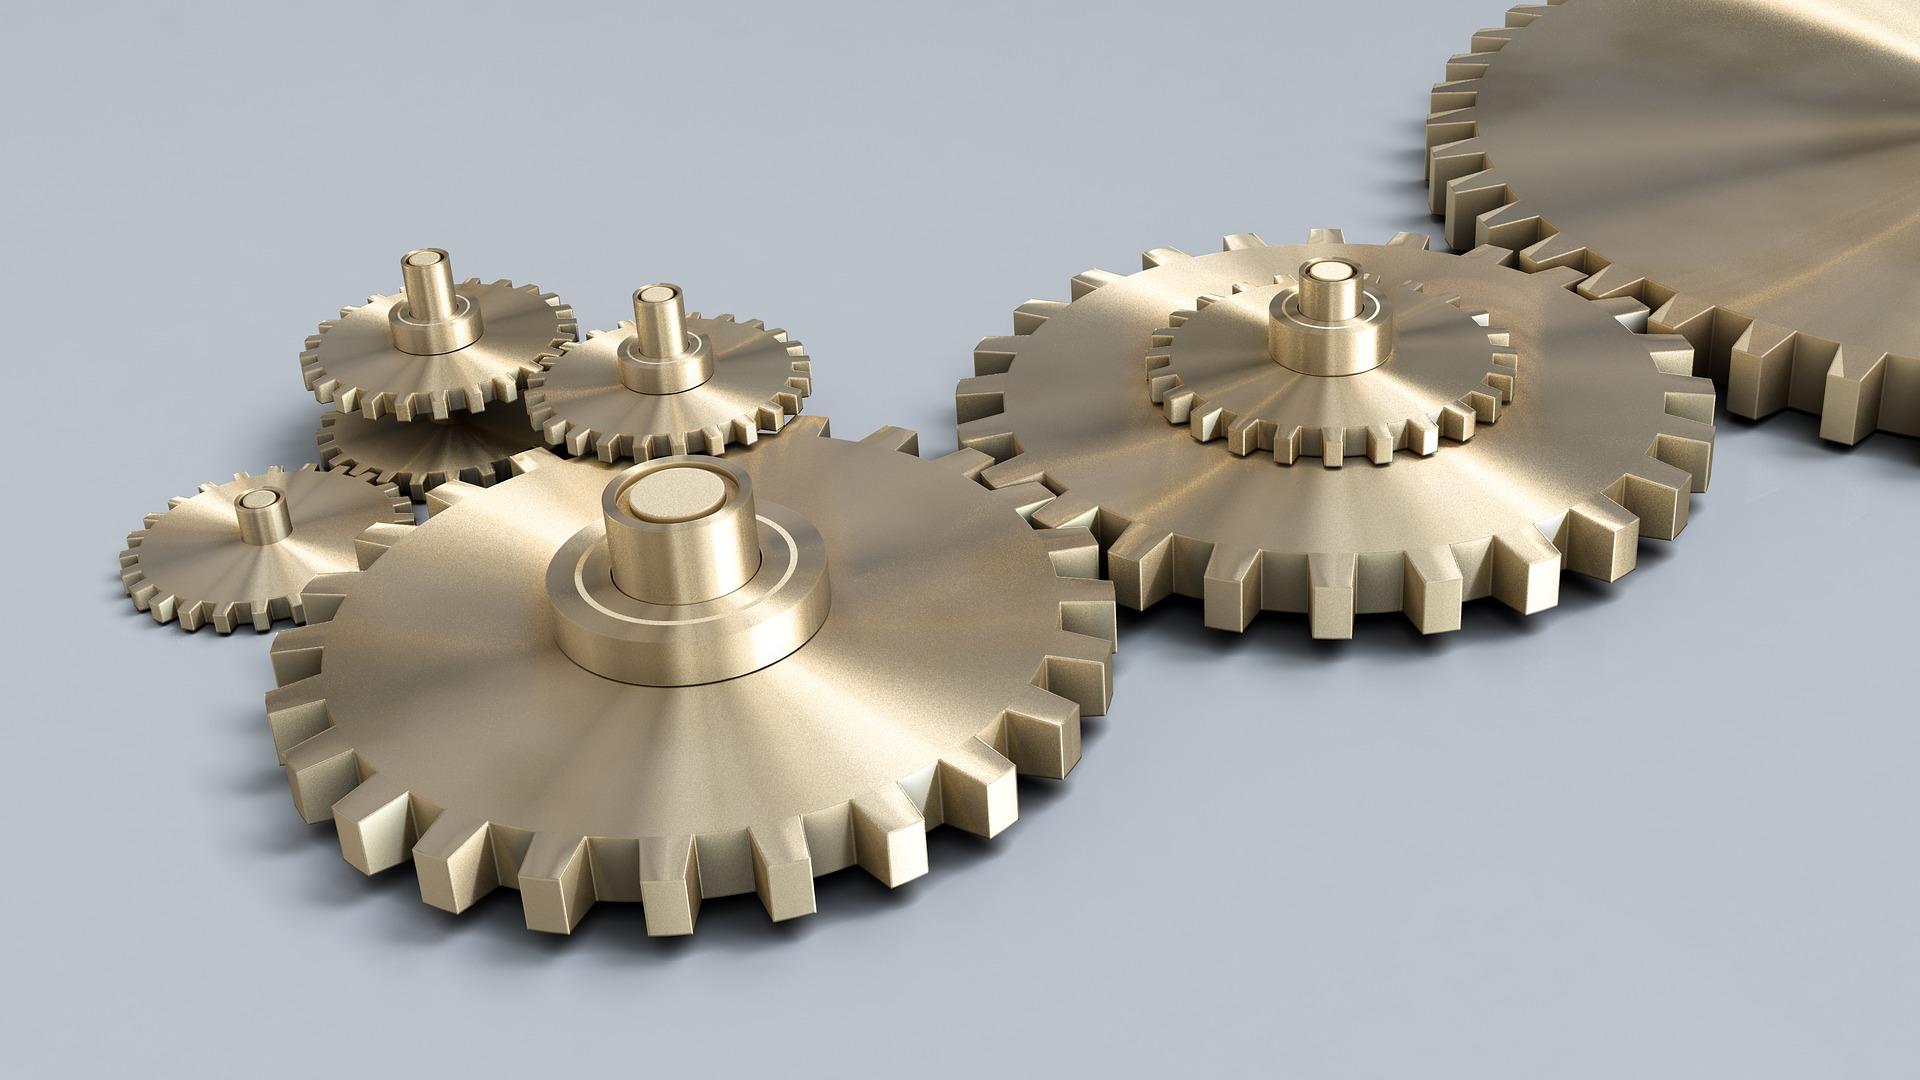 cog-wheels-2125181_1920